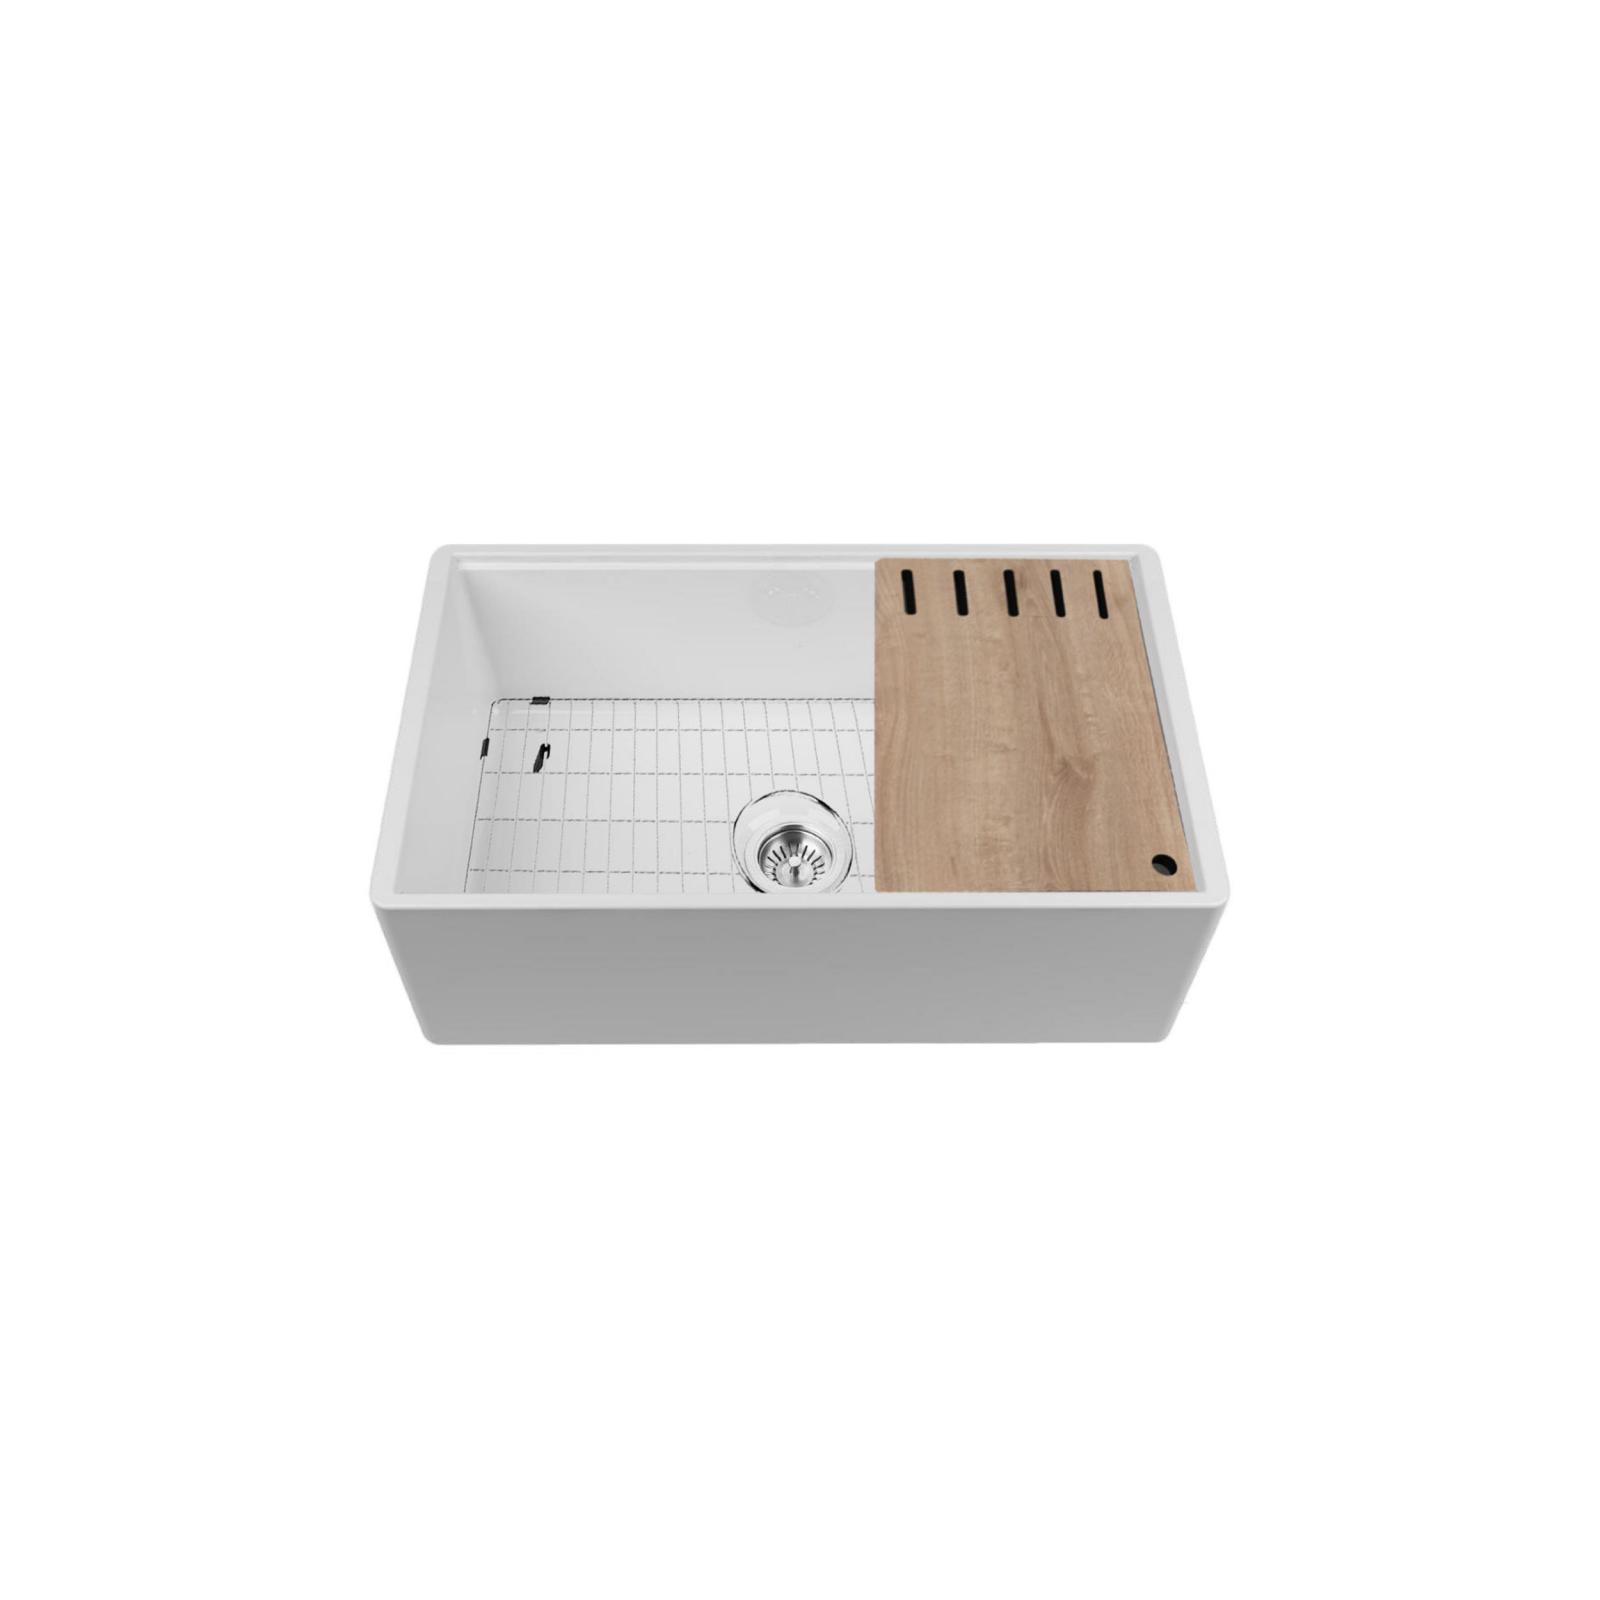 High-quality sink Louis Le Grand I - single bowl, ceramic - 3